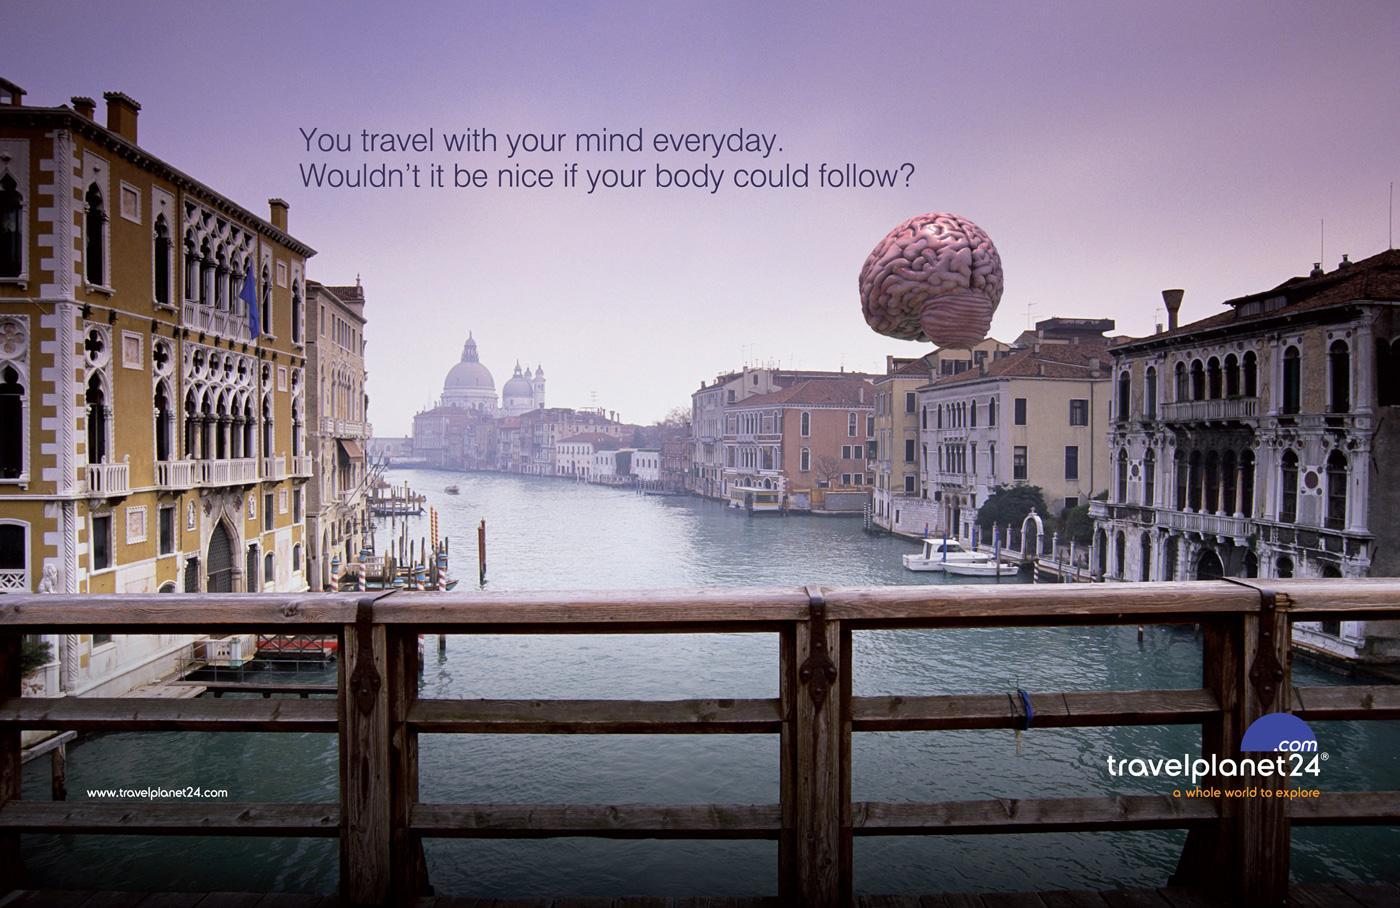 Travel Planet 24 Print Ad -  Venice